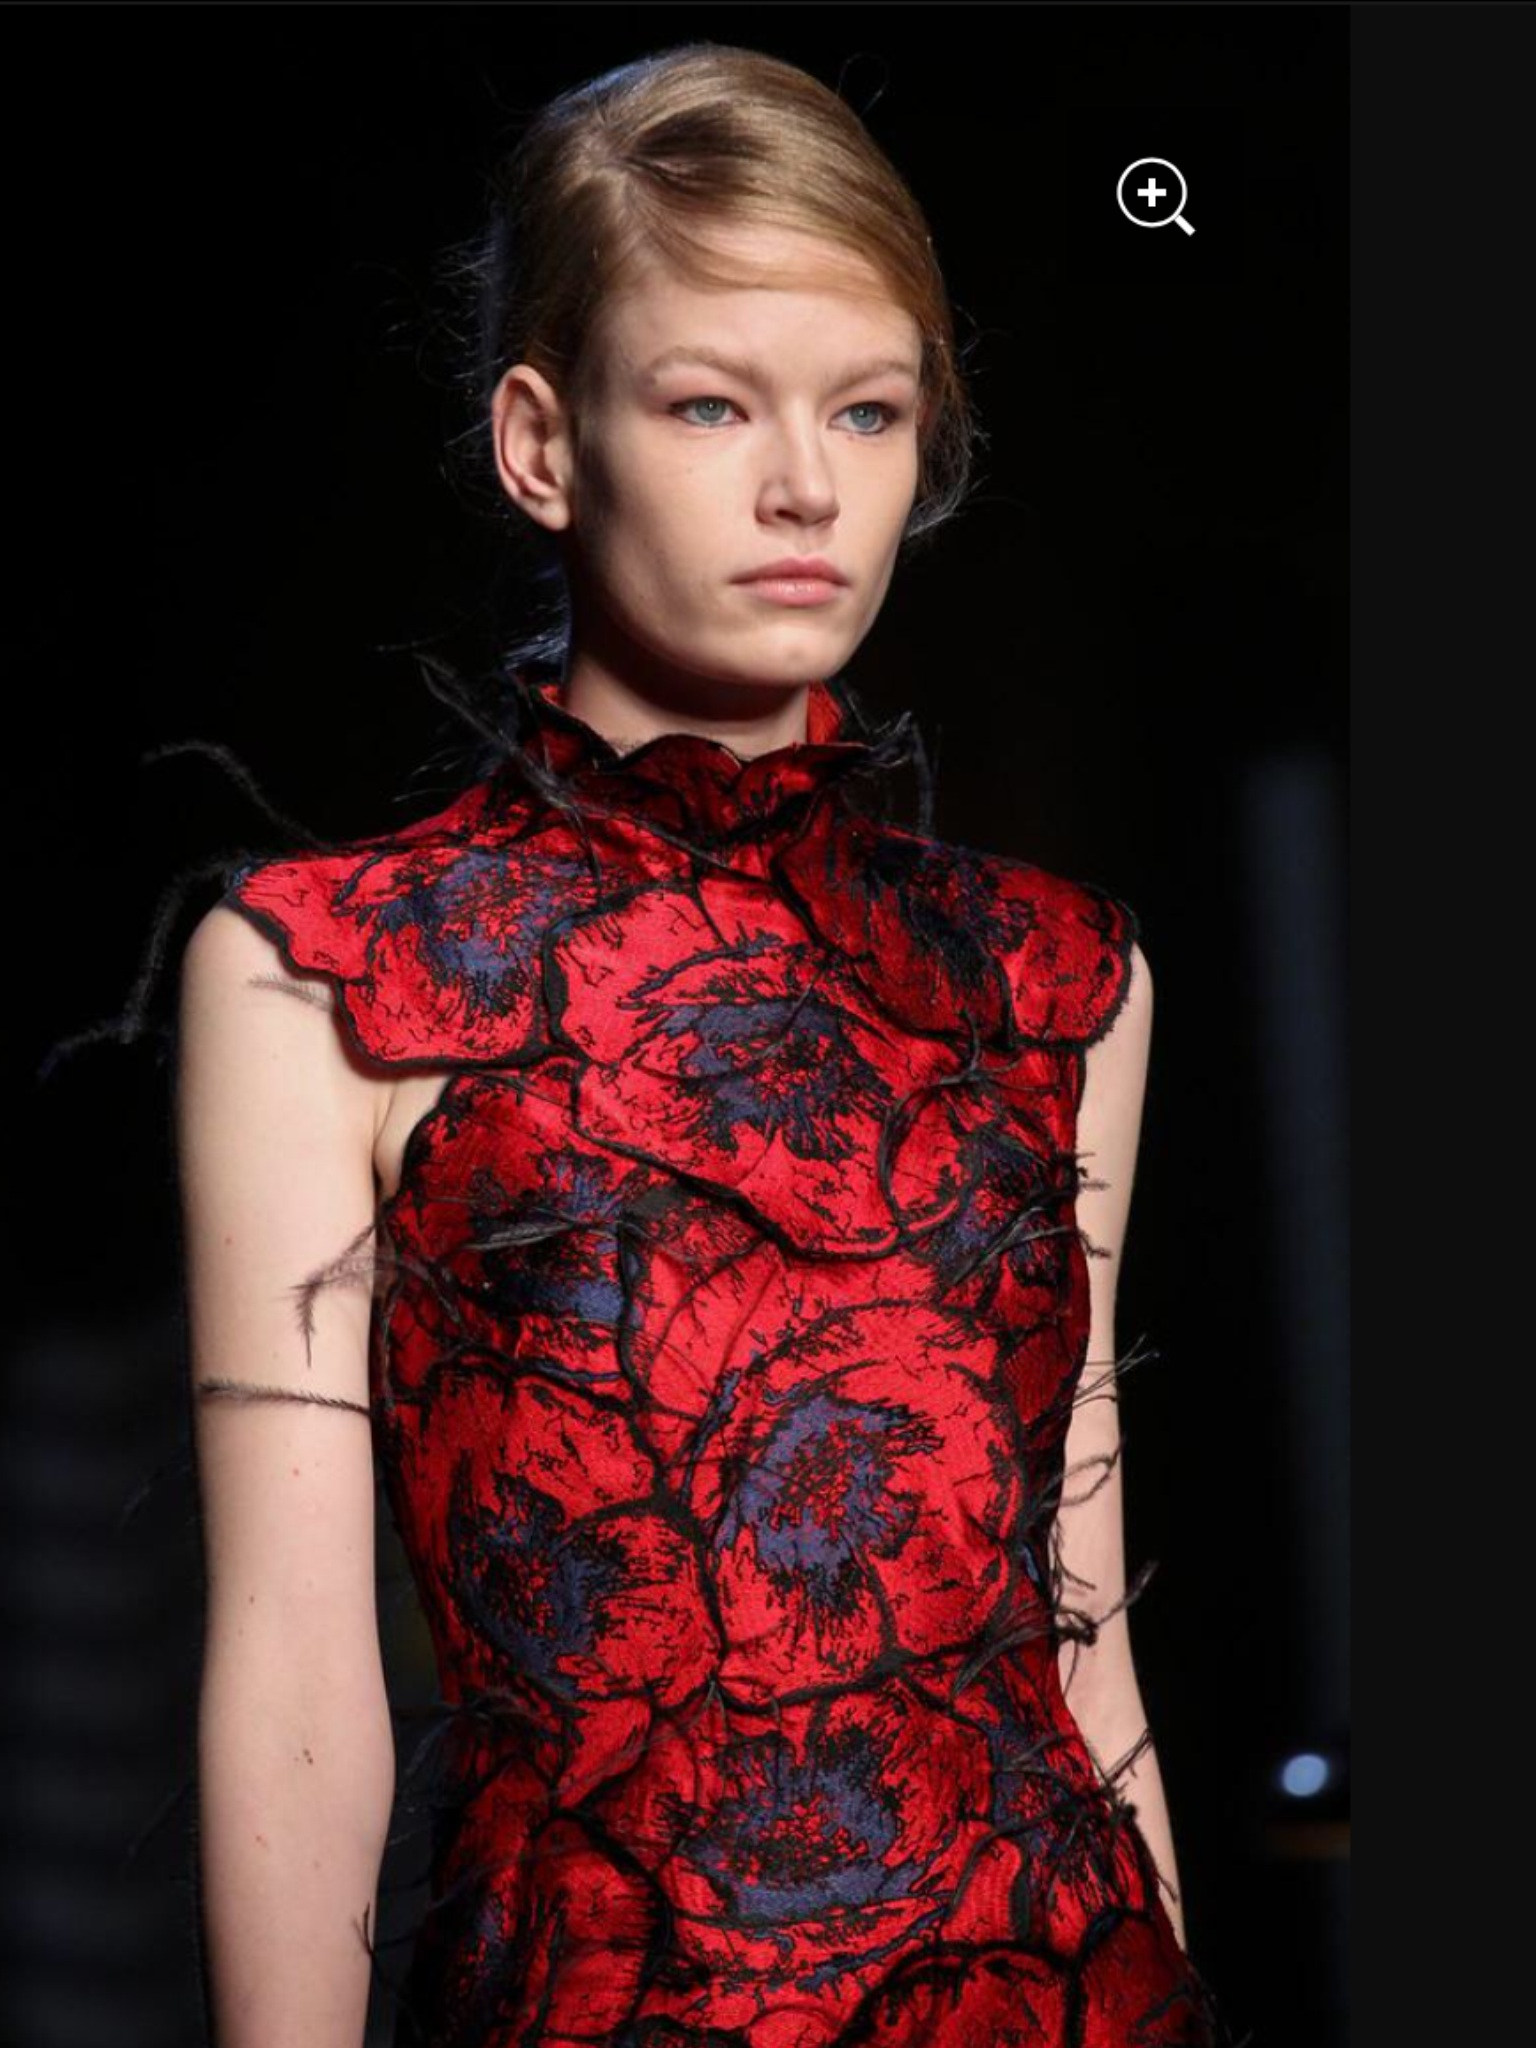 Fashion Designer Erdem on the catwalk